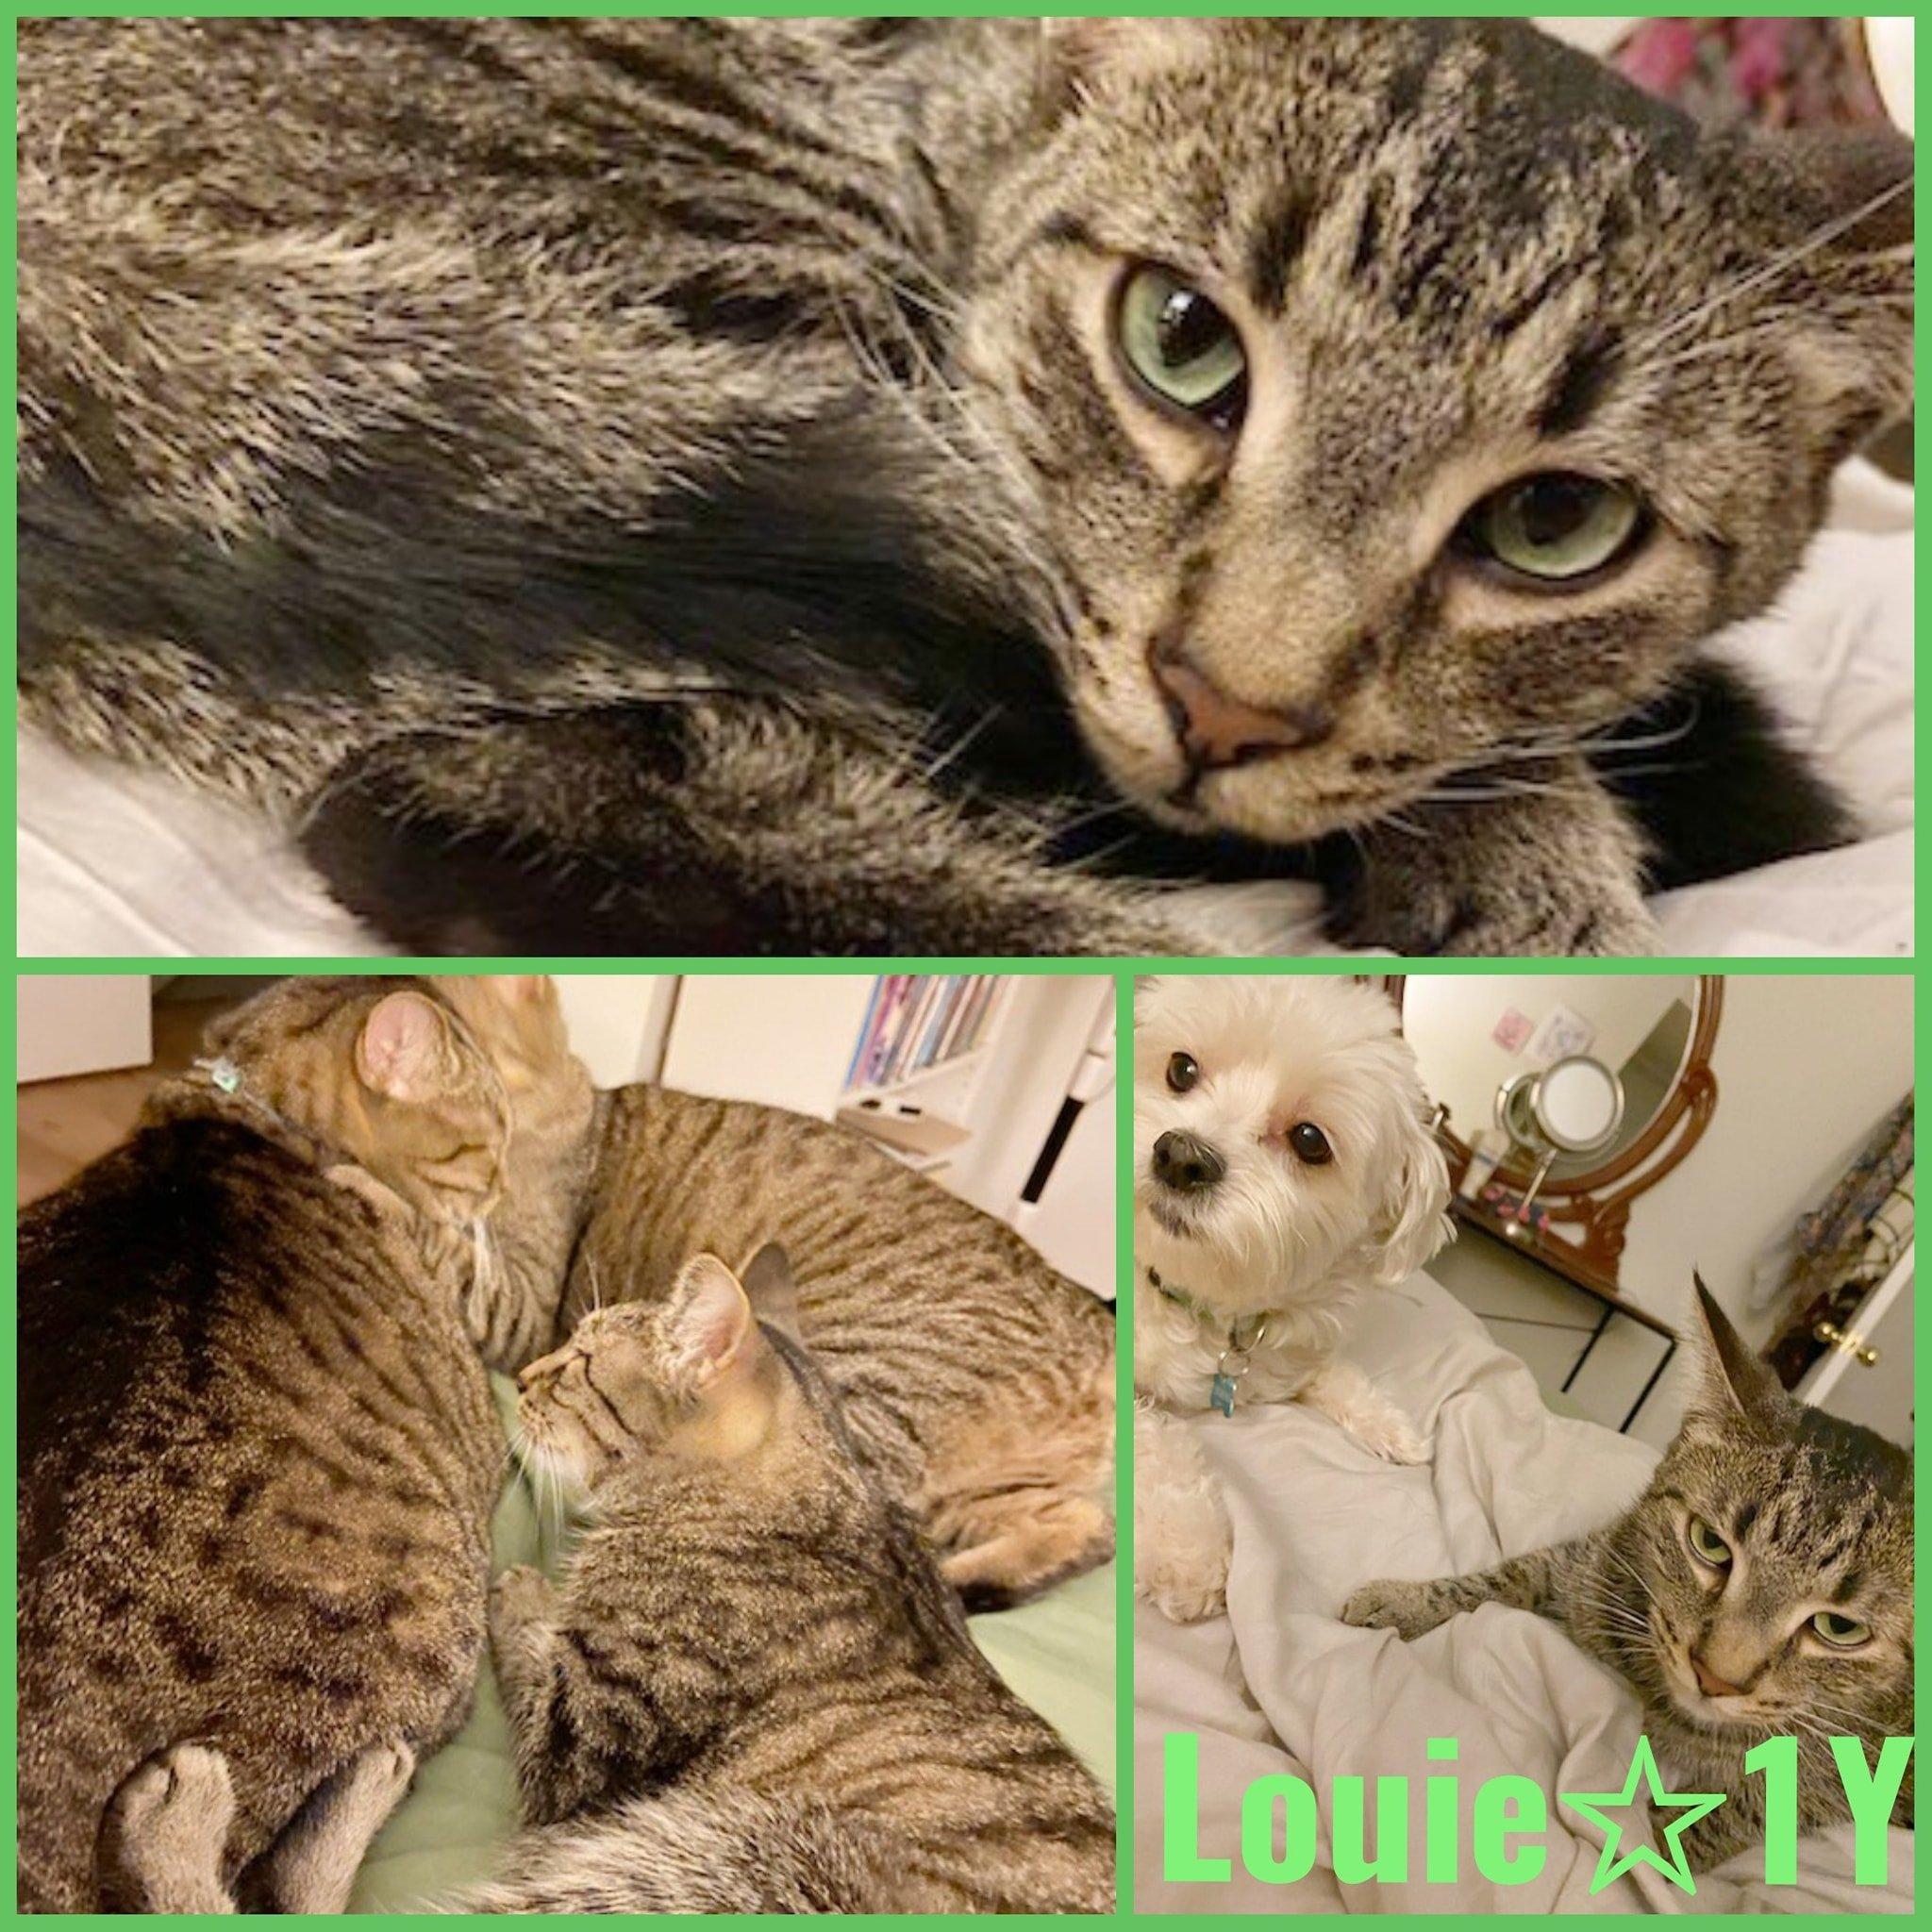 Louie-Male-1 Year